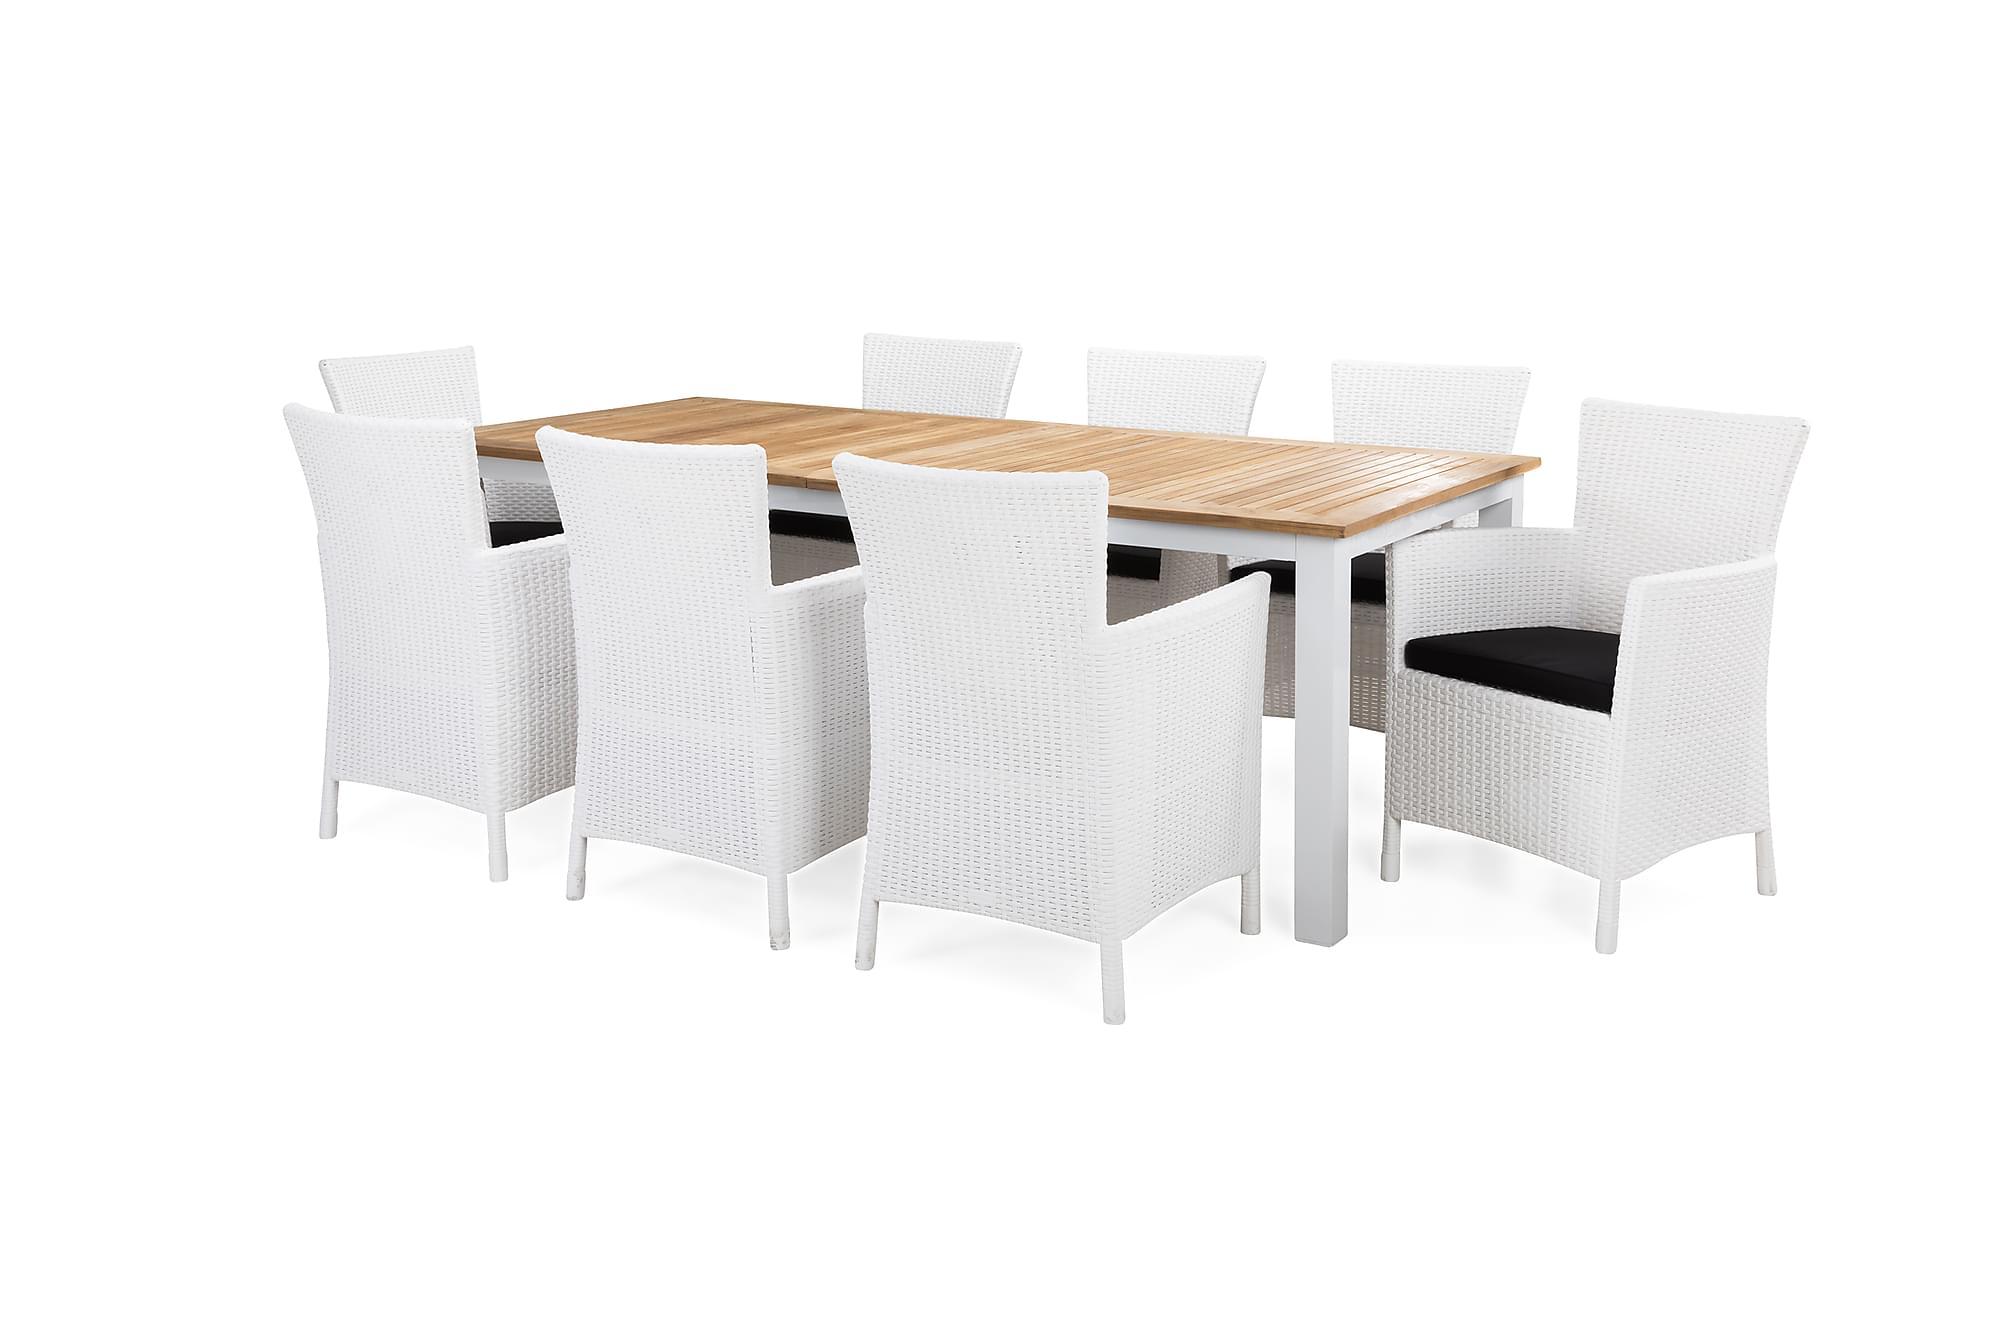 Redding bord 220 + 8 yorkton fåtölj vit/teak + dyna svart